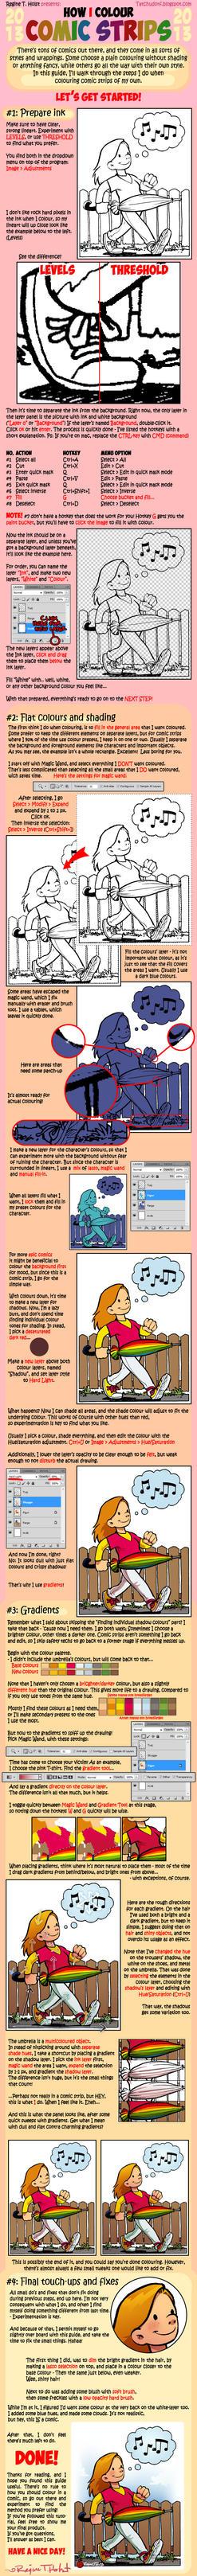 Tutorial - How I colour comic strips by Tatchu